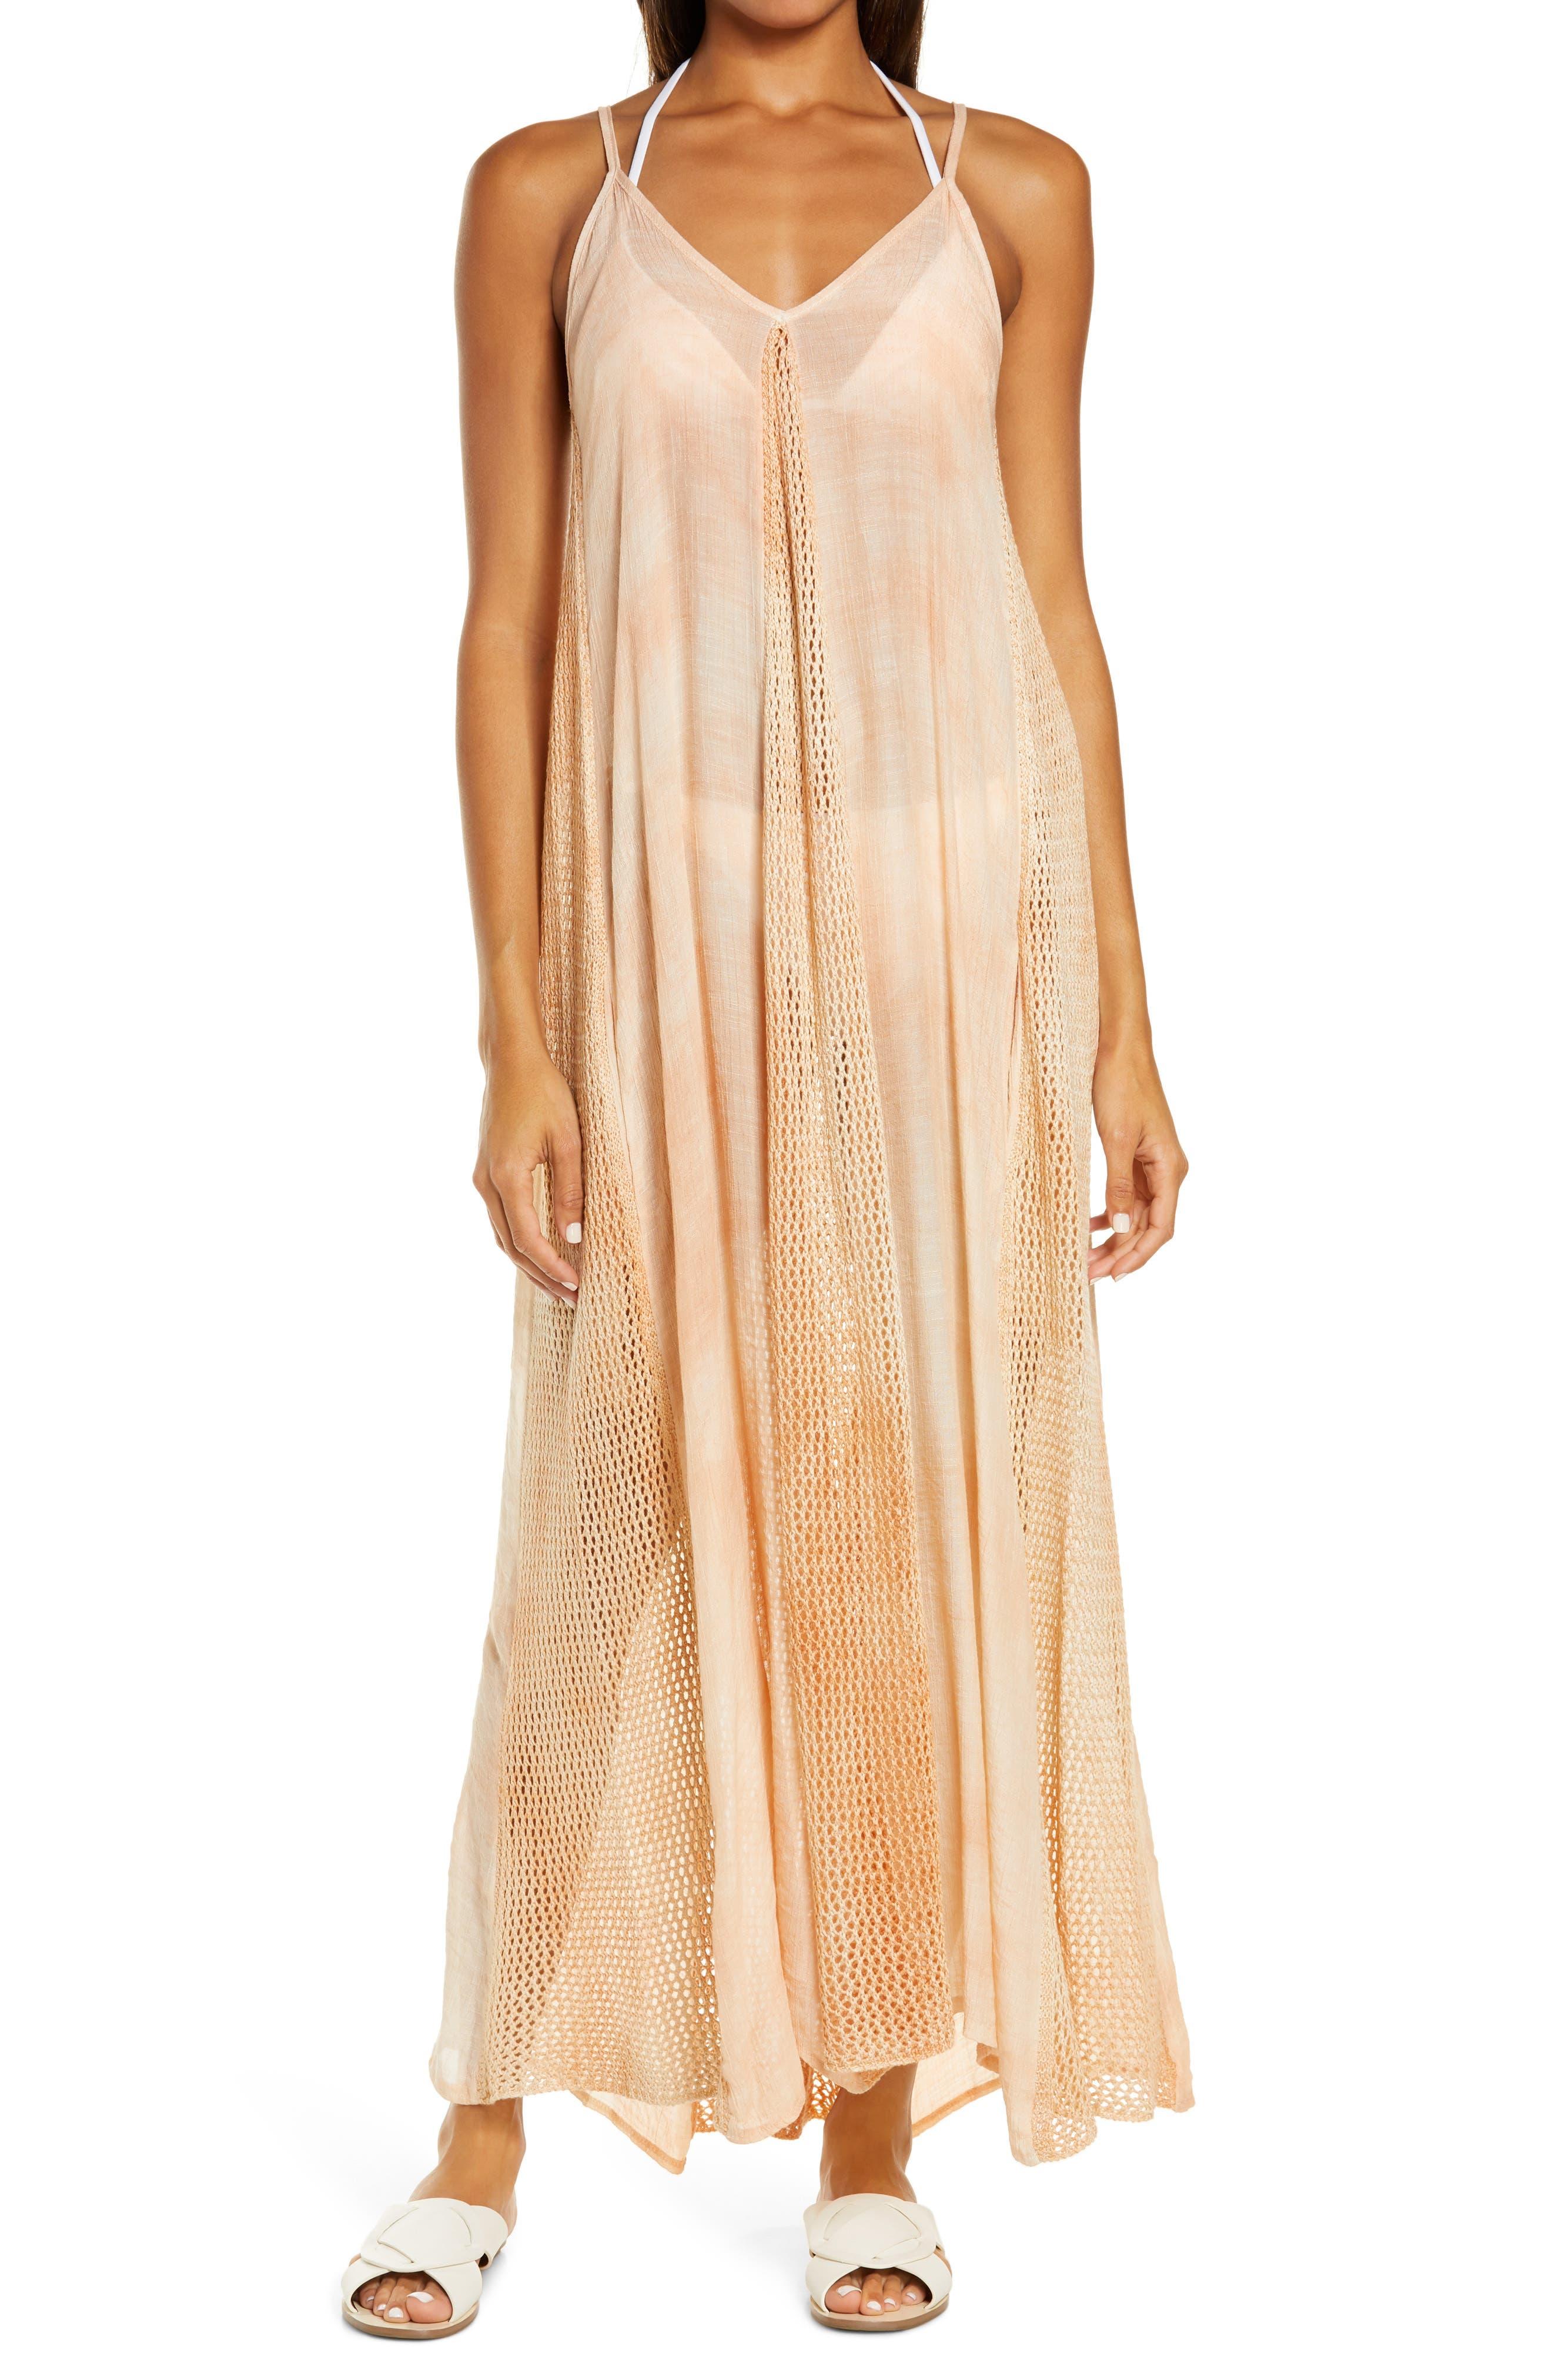 Crochet Godet Cover-Up Maxi Dress